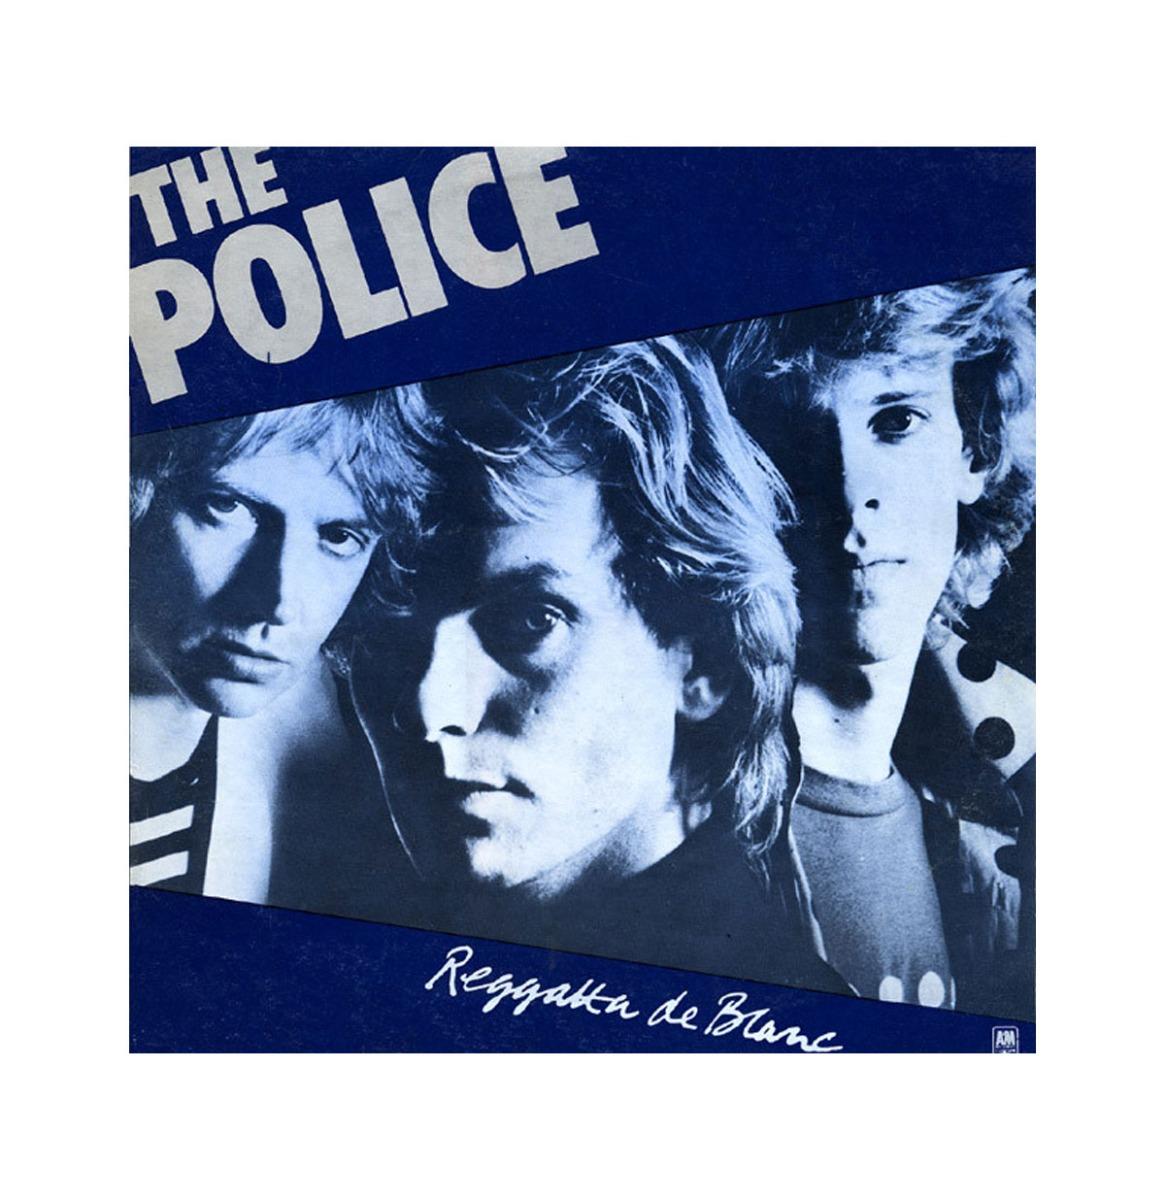 The Police - Reggatta de Blanc LP